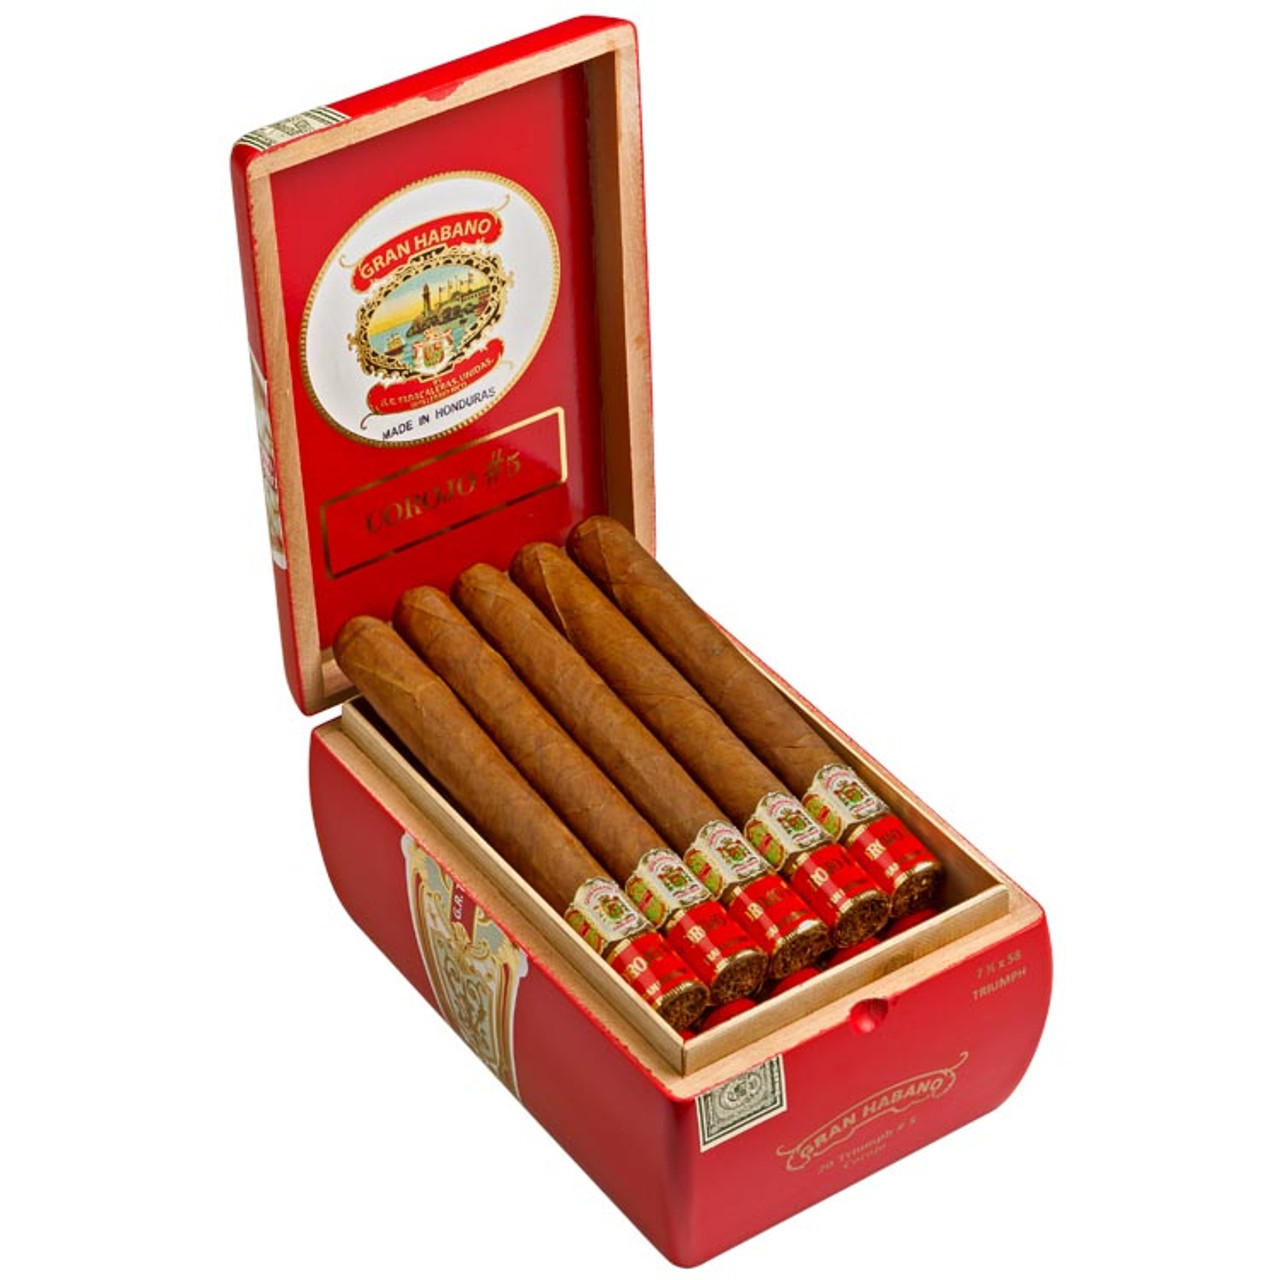 Gran Habano #5 Corojo Triumph Cigars - 7.5 x 58 (Box of 20)